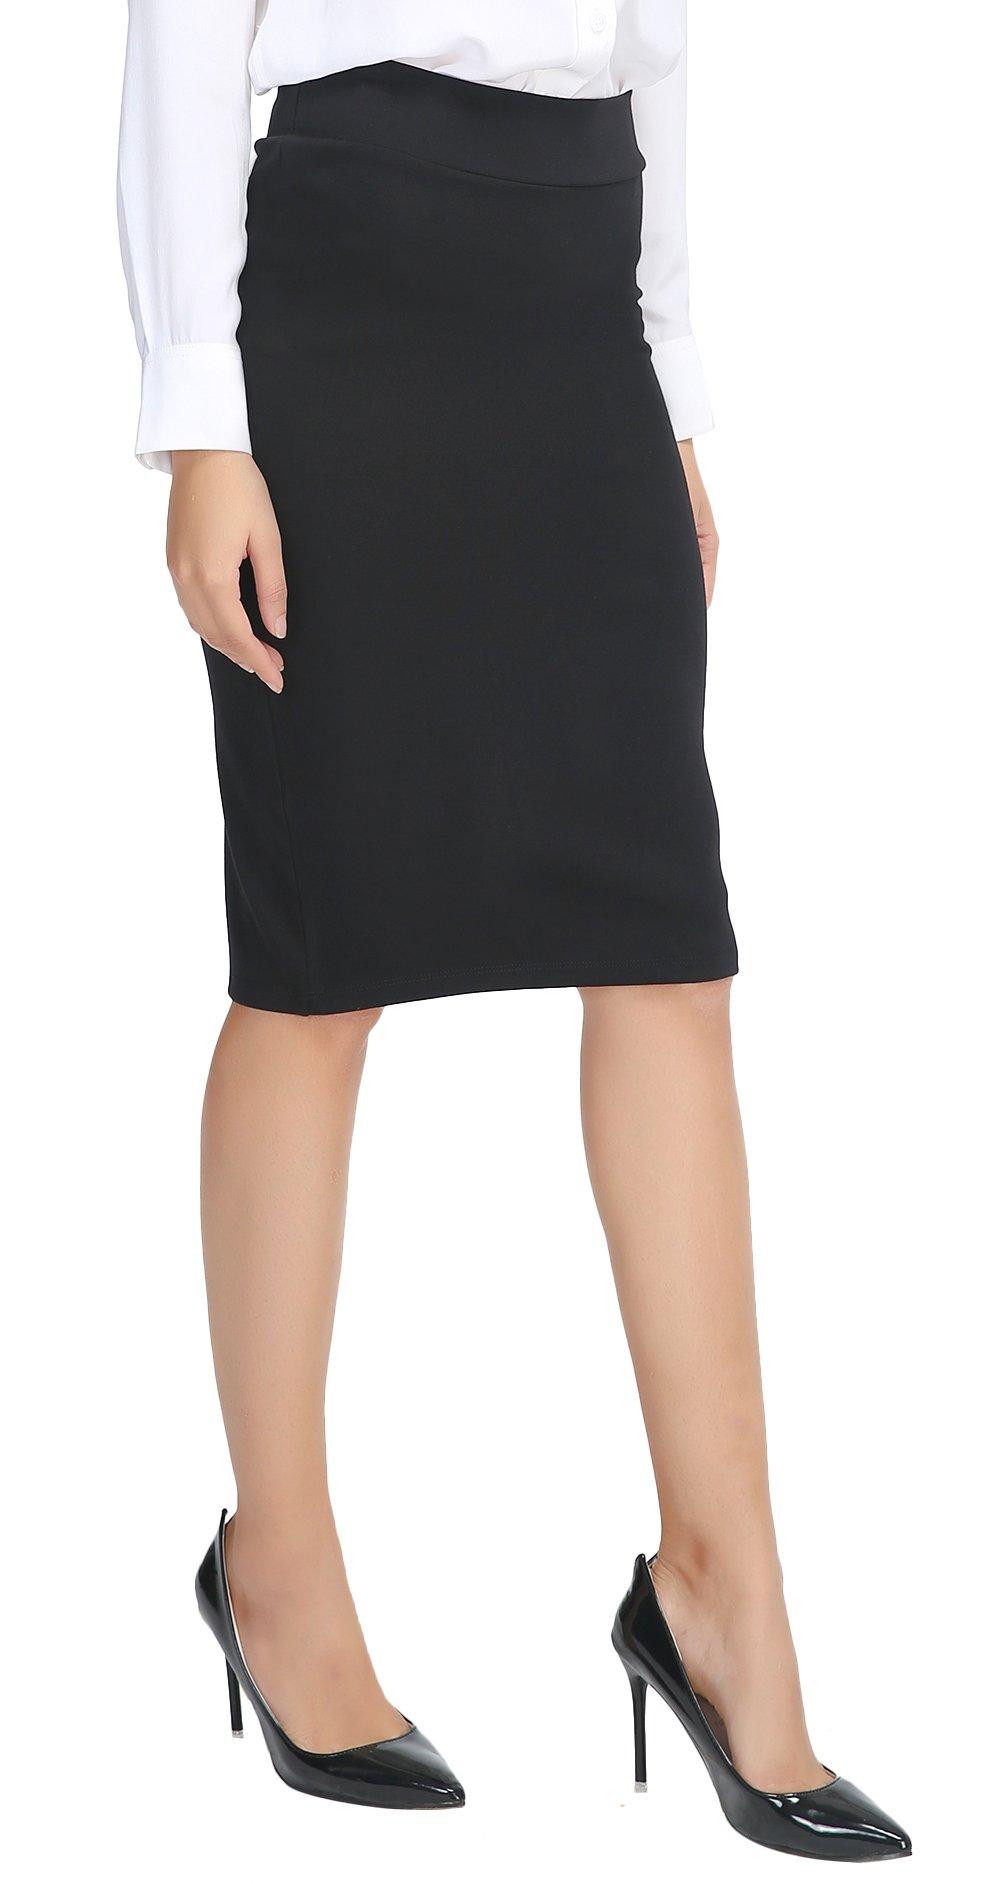 Urban CoCo Women's Elastic Waist Stretch Bodycon Midi Pencil Skirt (L, Black)